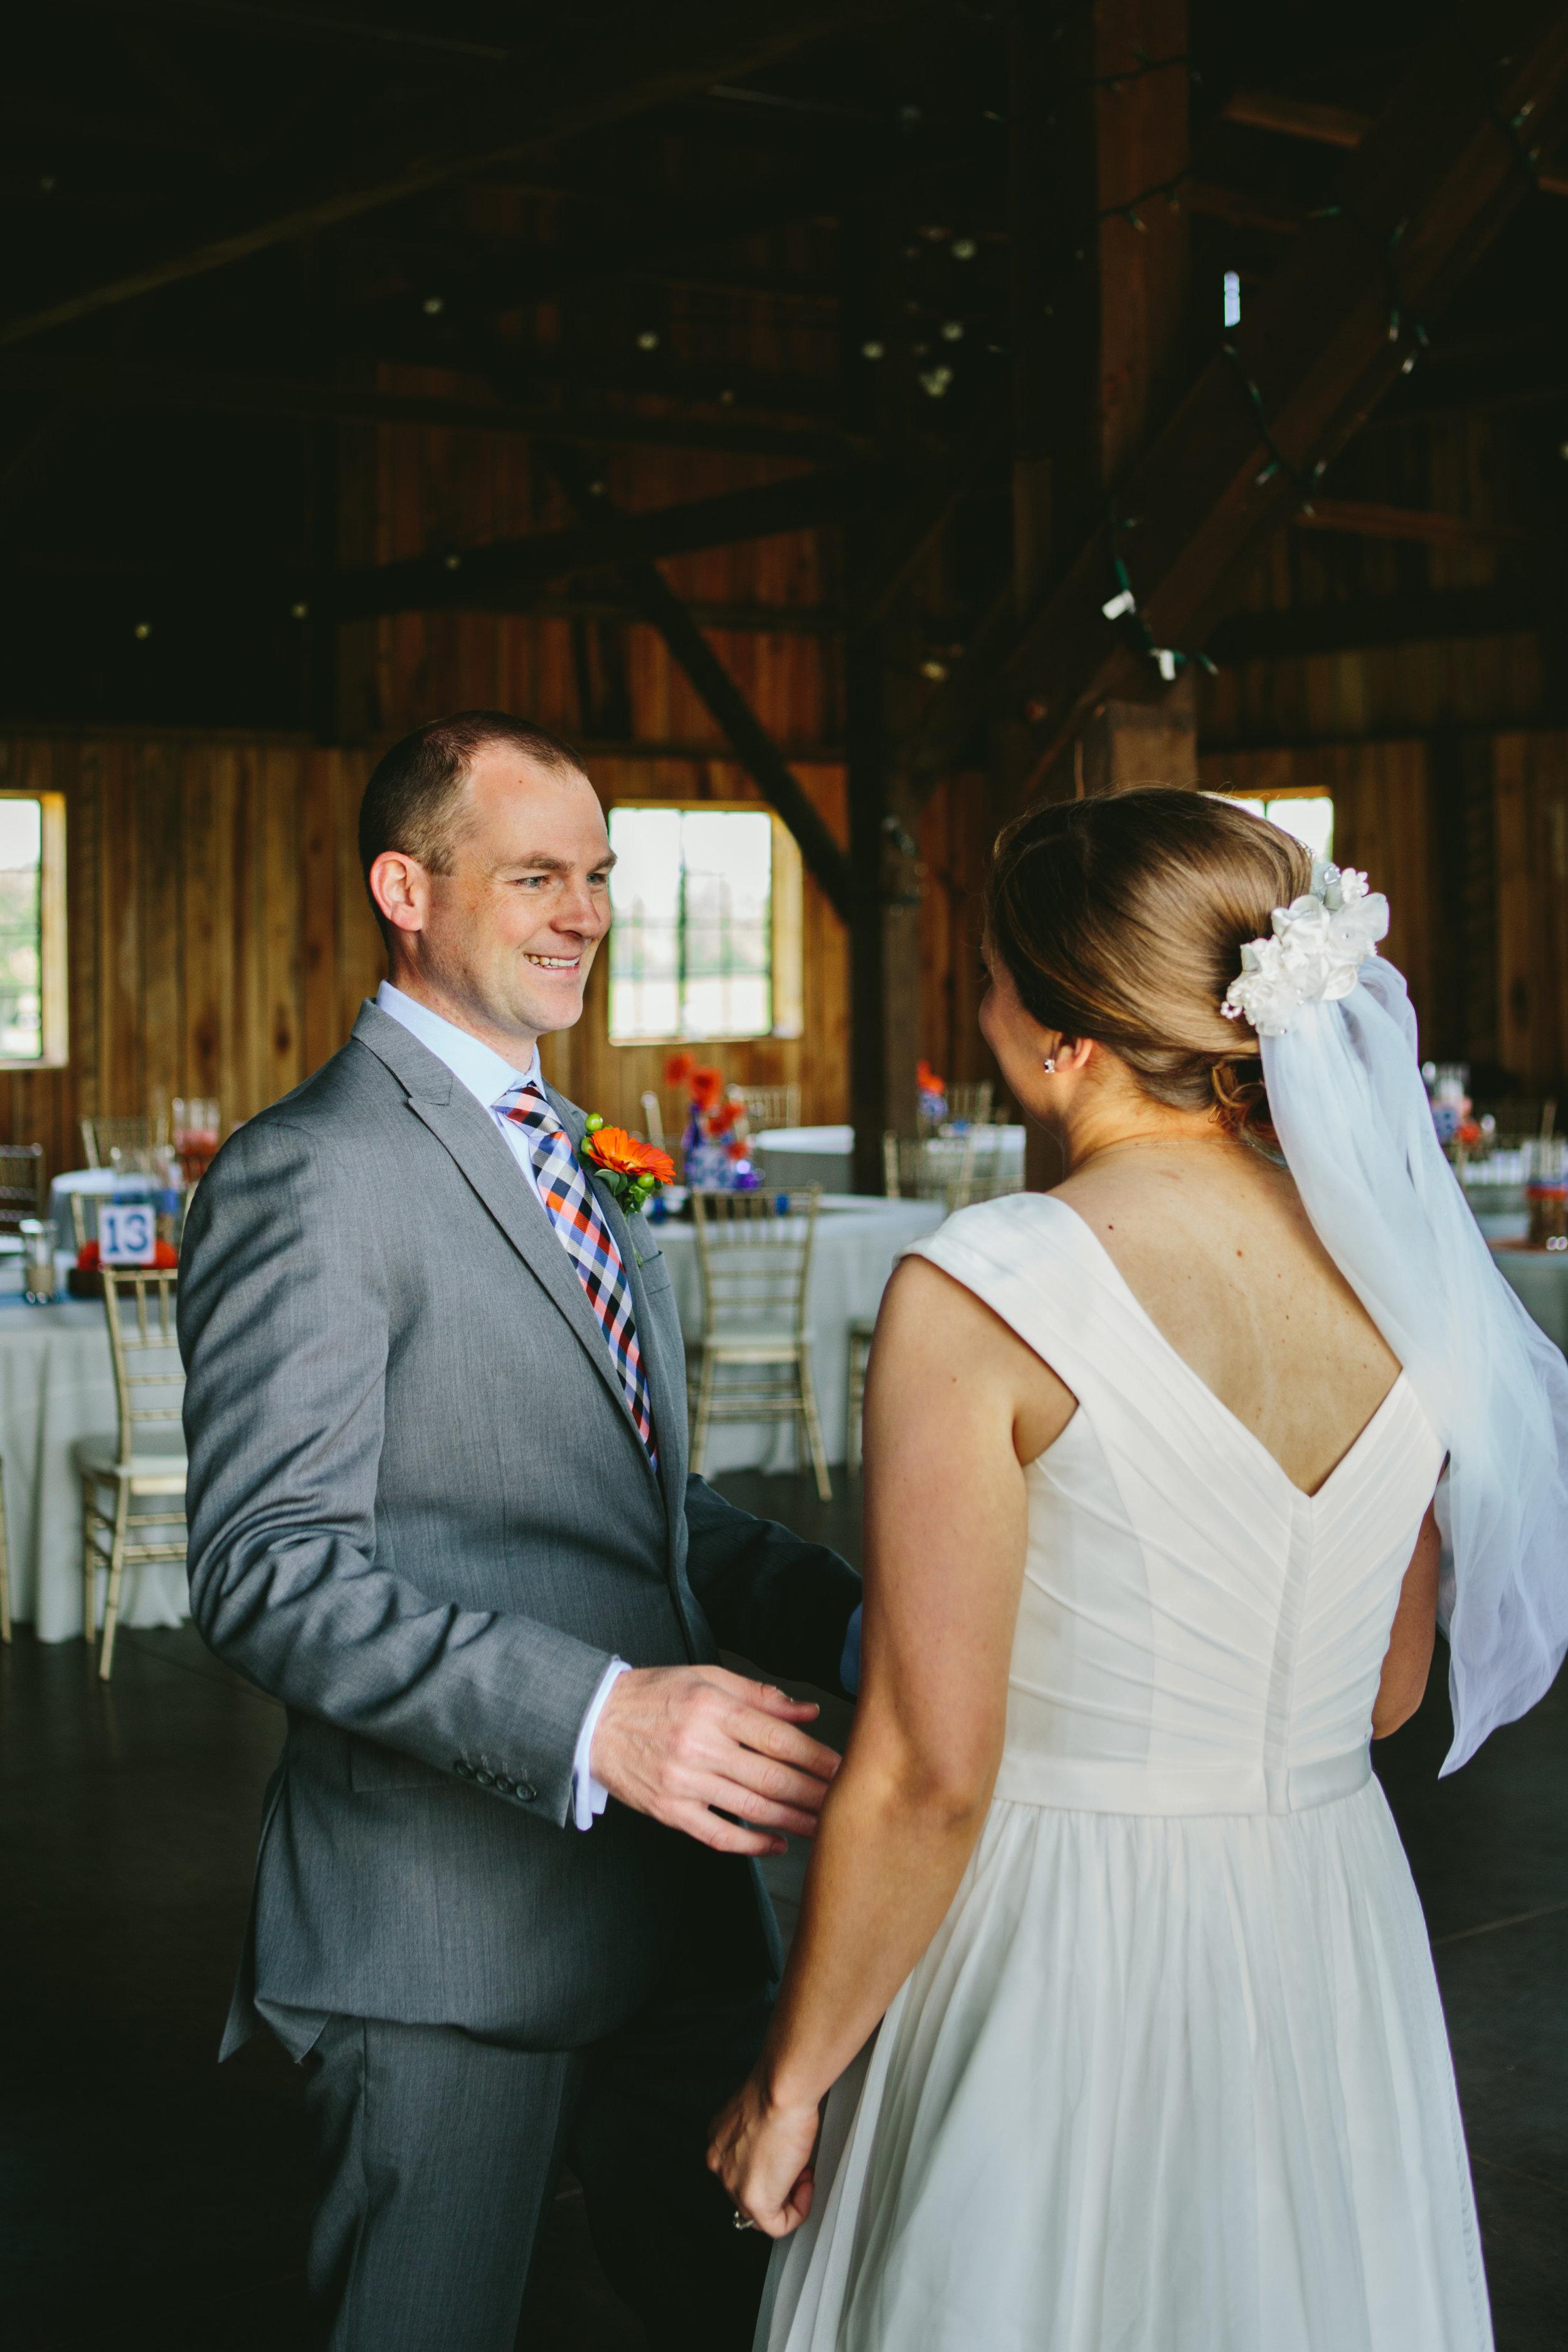 Whitesell-Mattioda Wedding-167.jpg